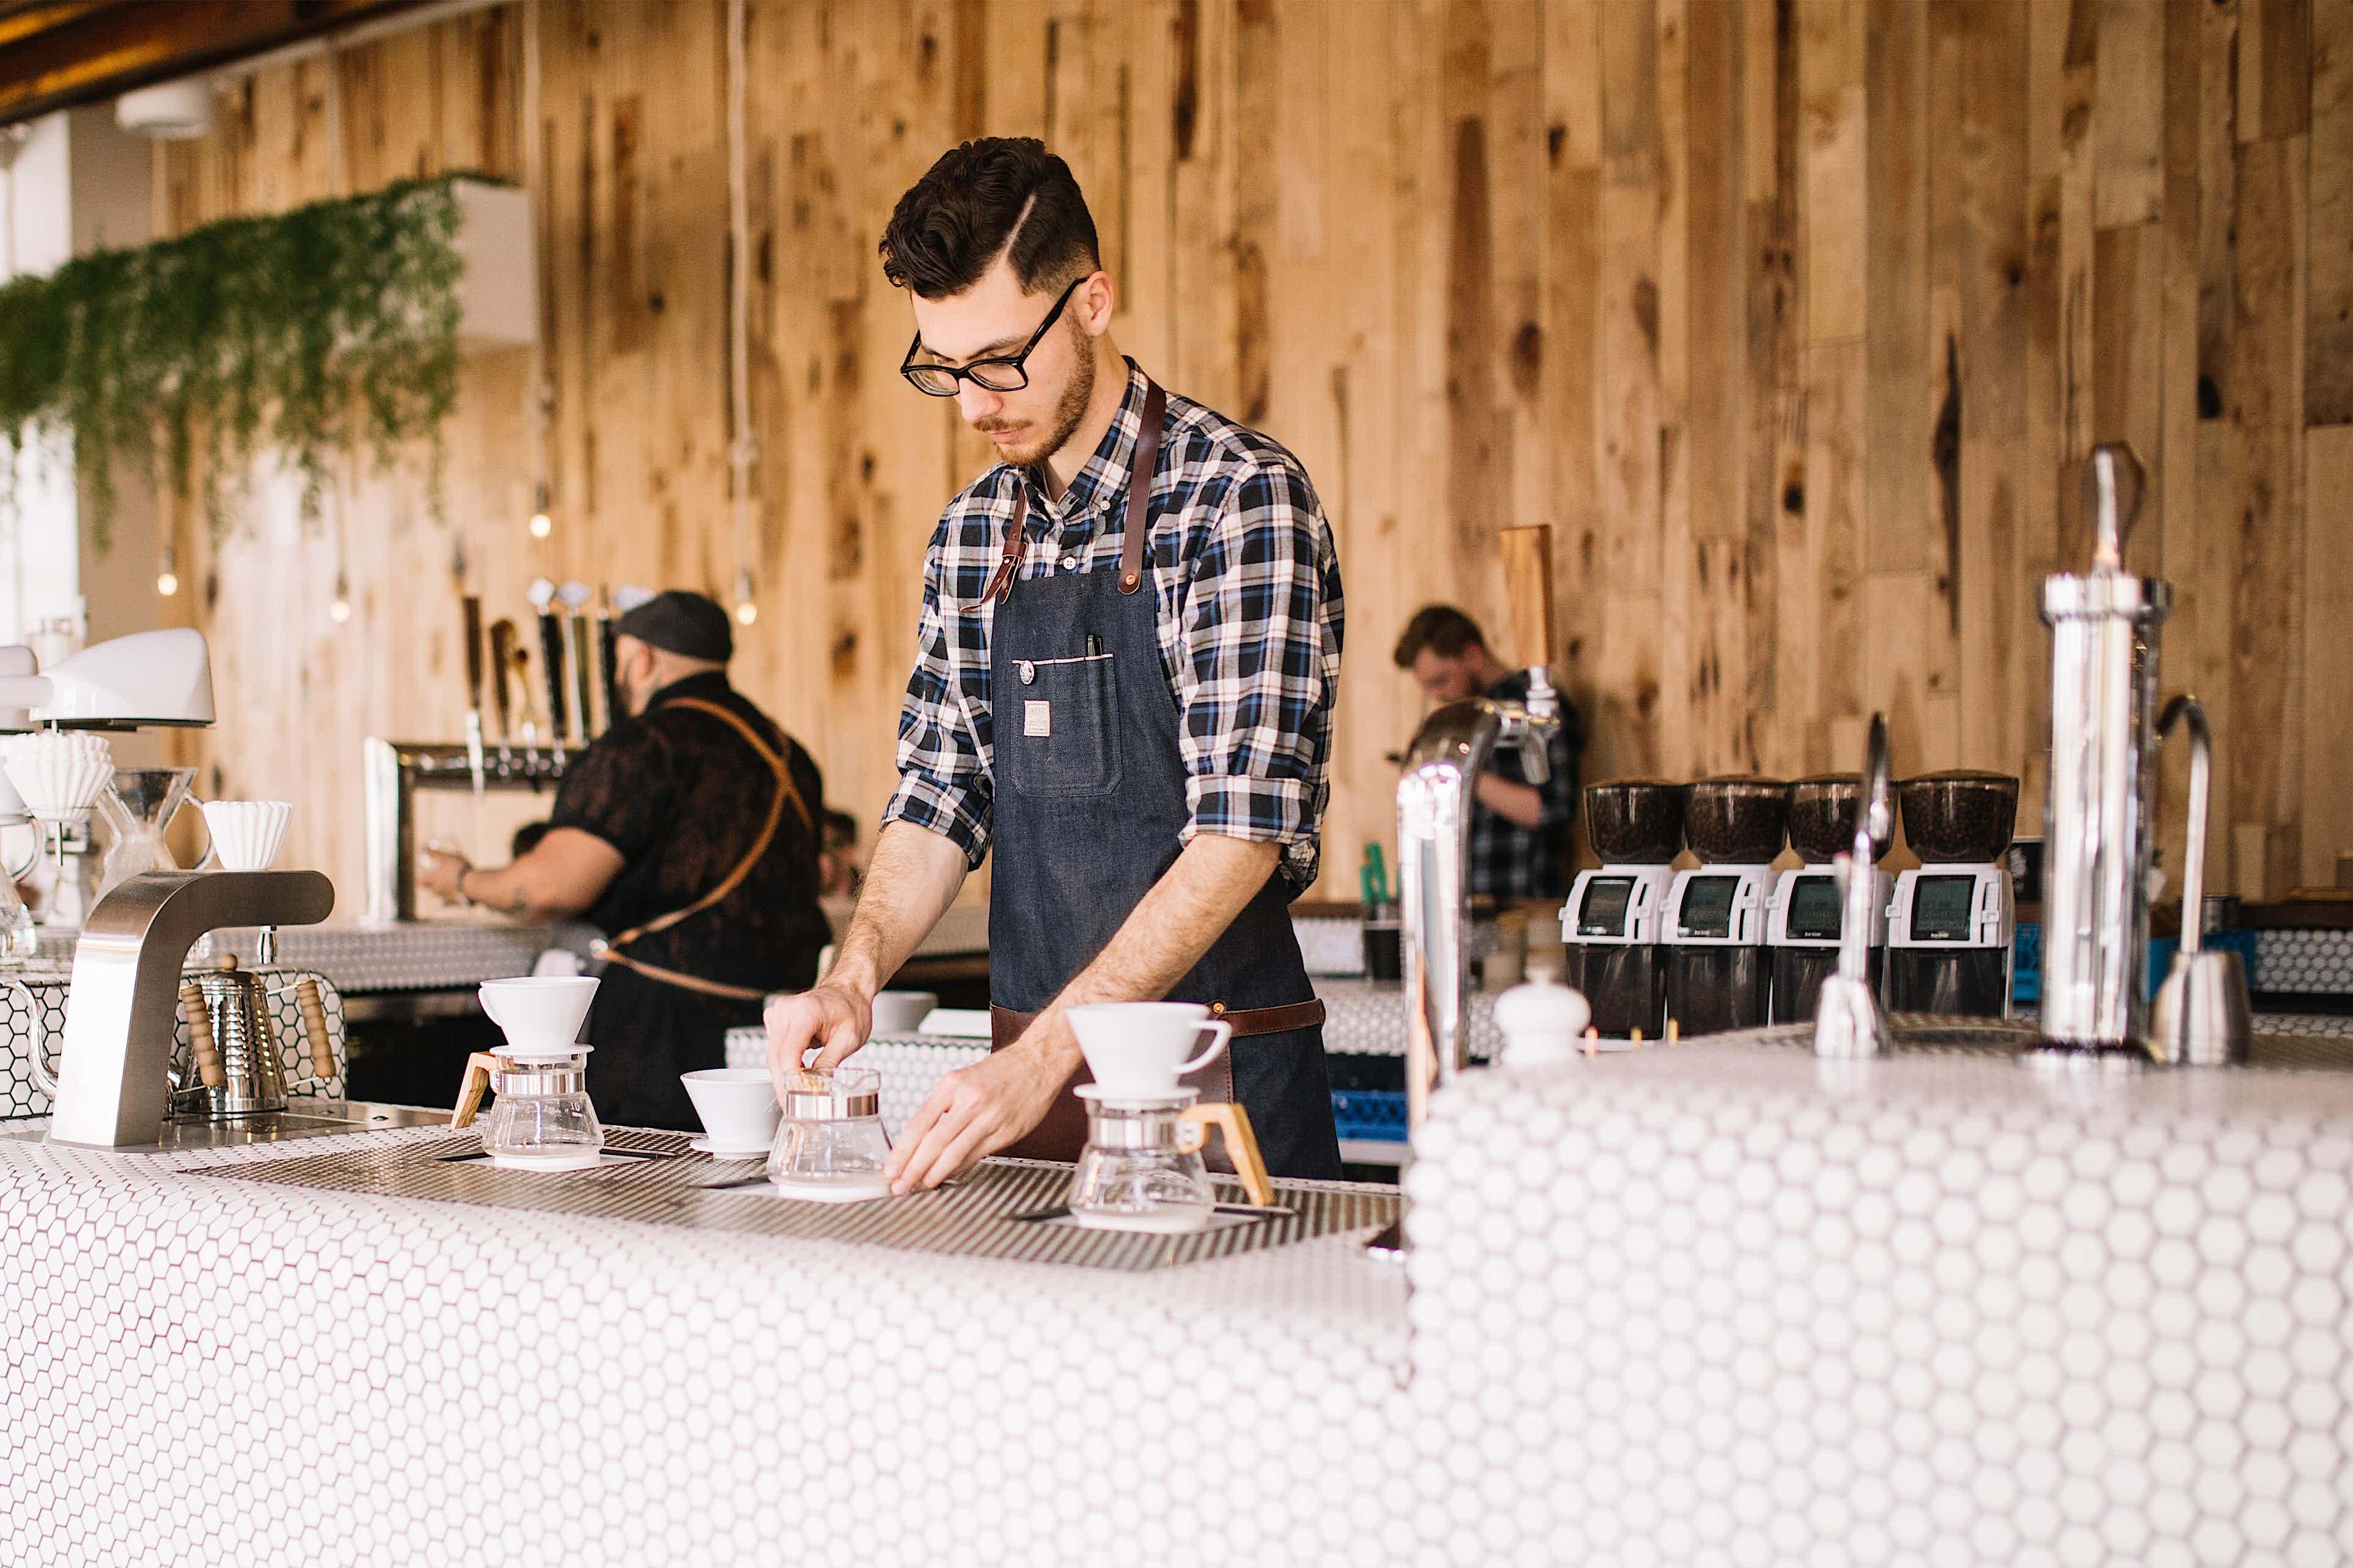 Café Theke mit Mitarbeiter